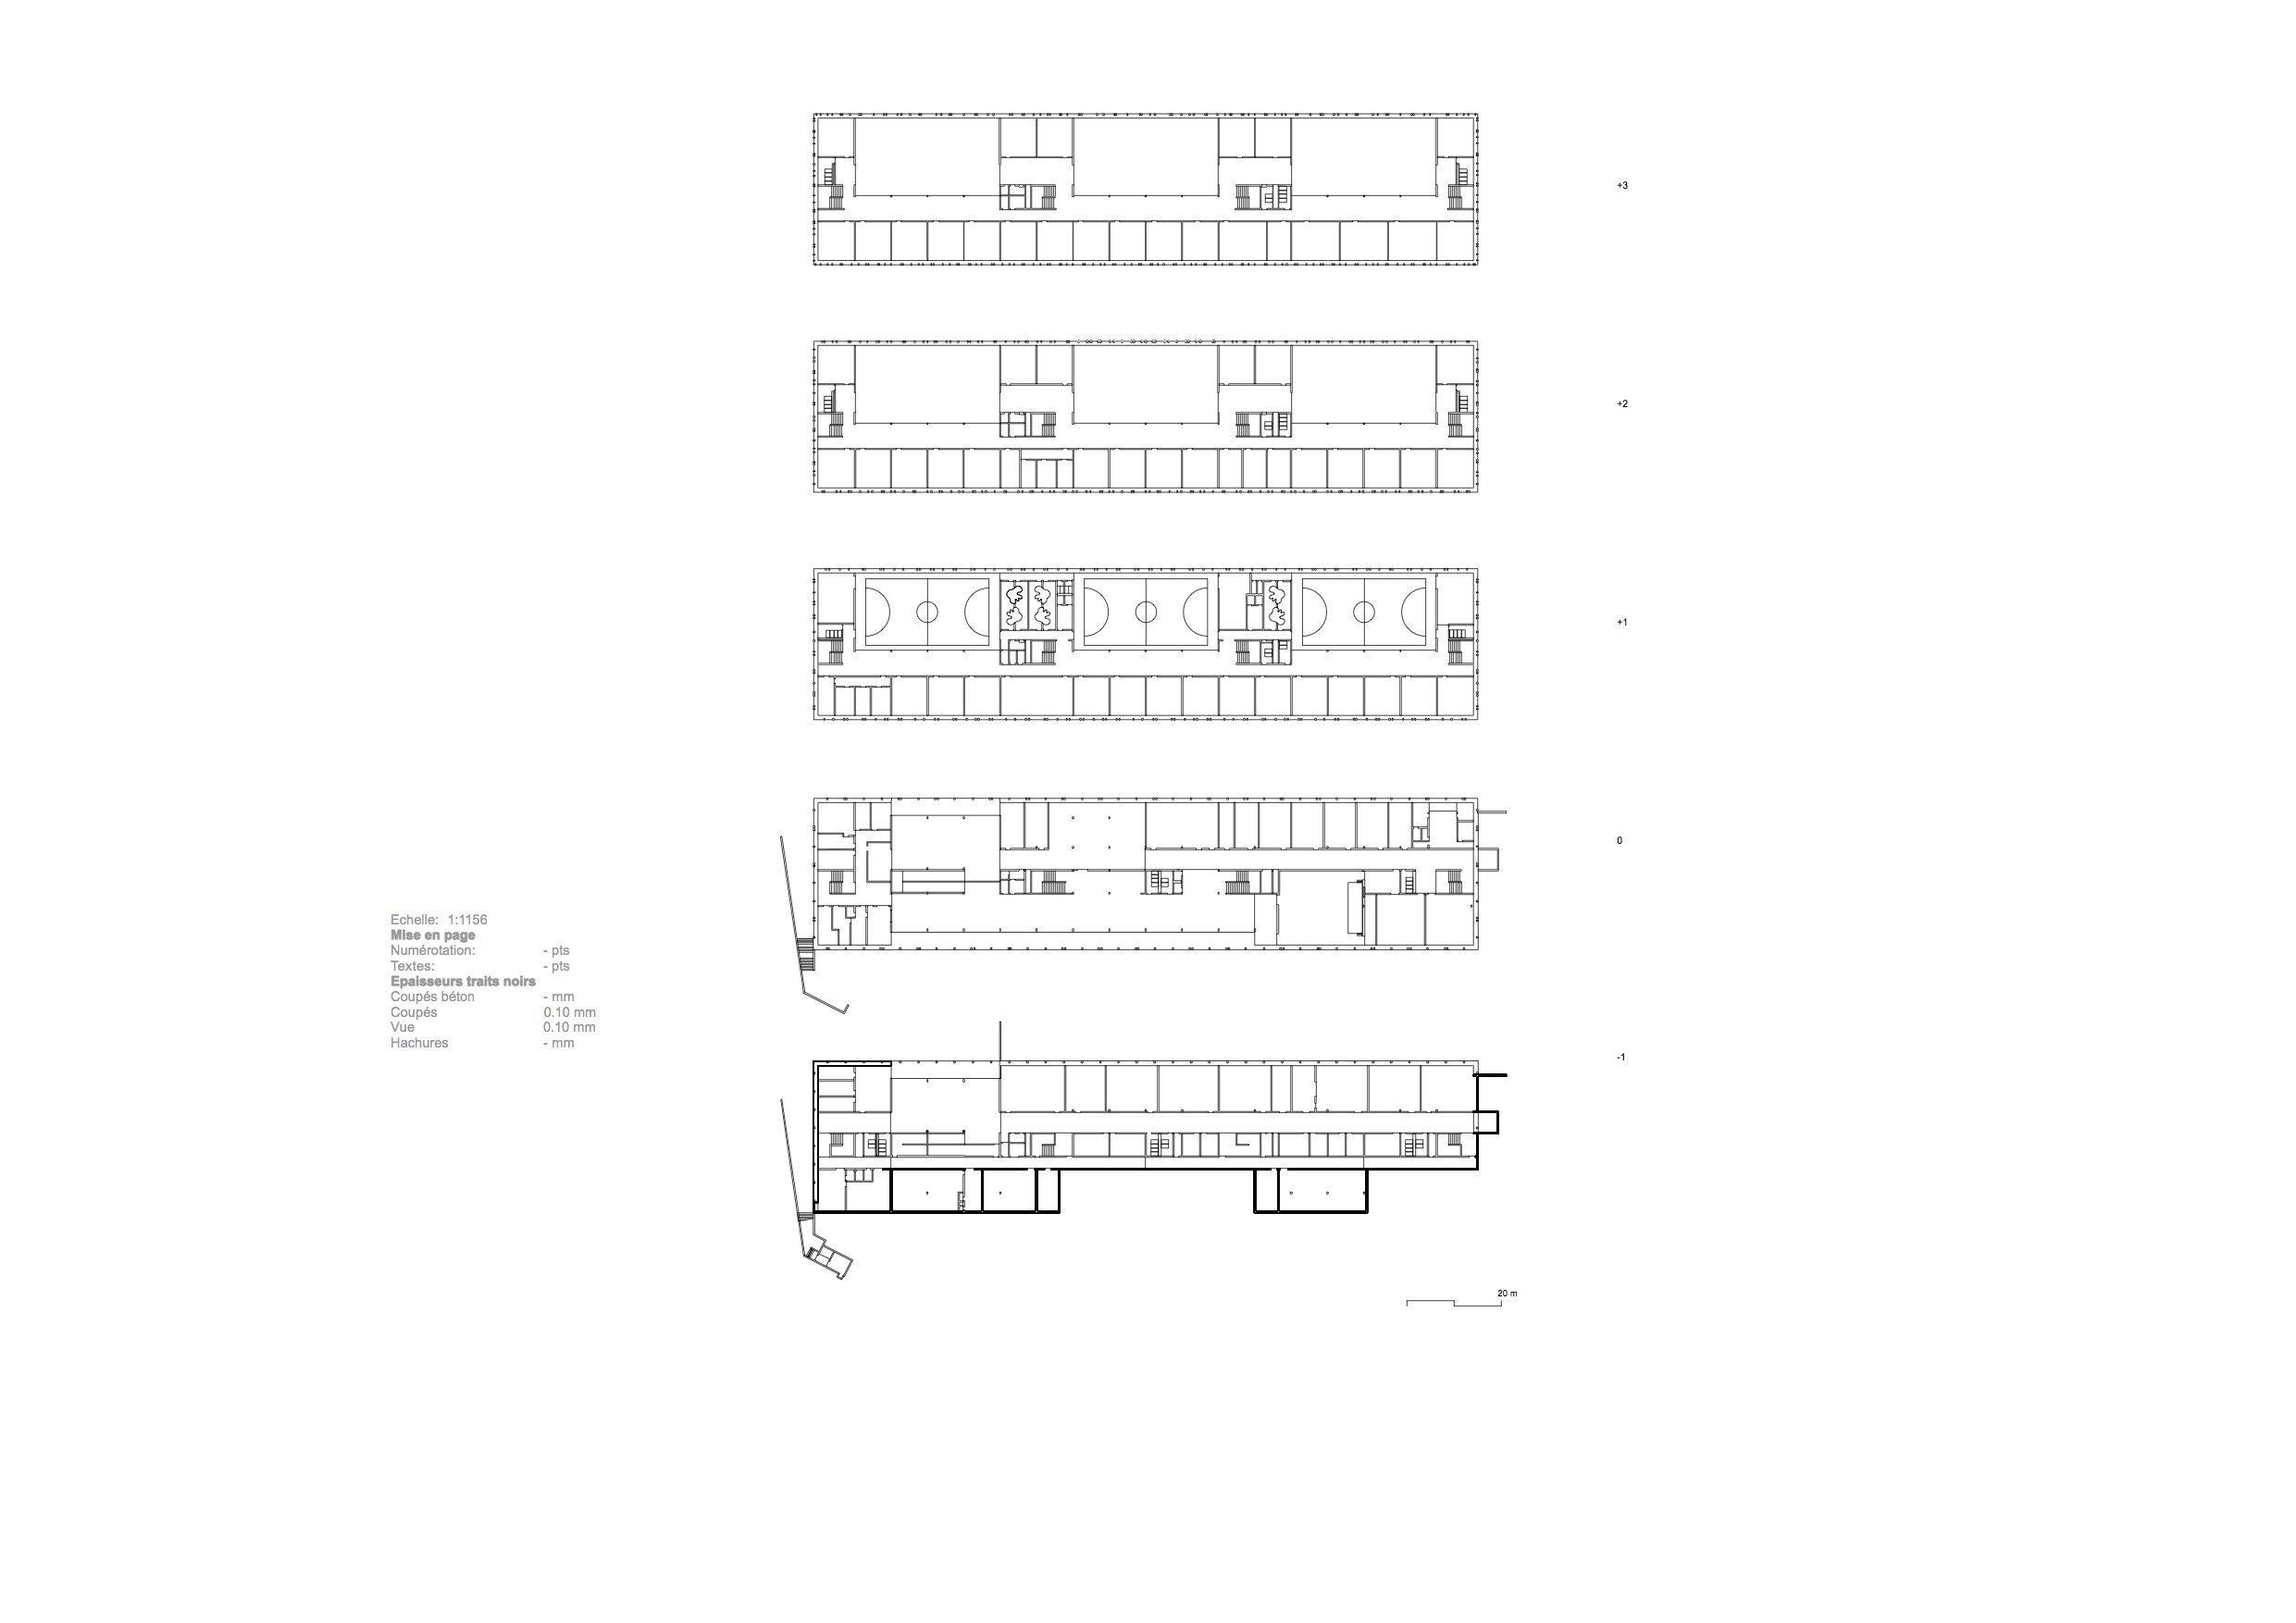 Prix beton cir m2 free stunning plan de travail cuisine for Sol beton cire prix m2